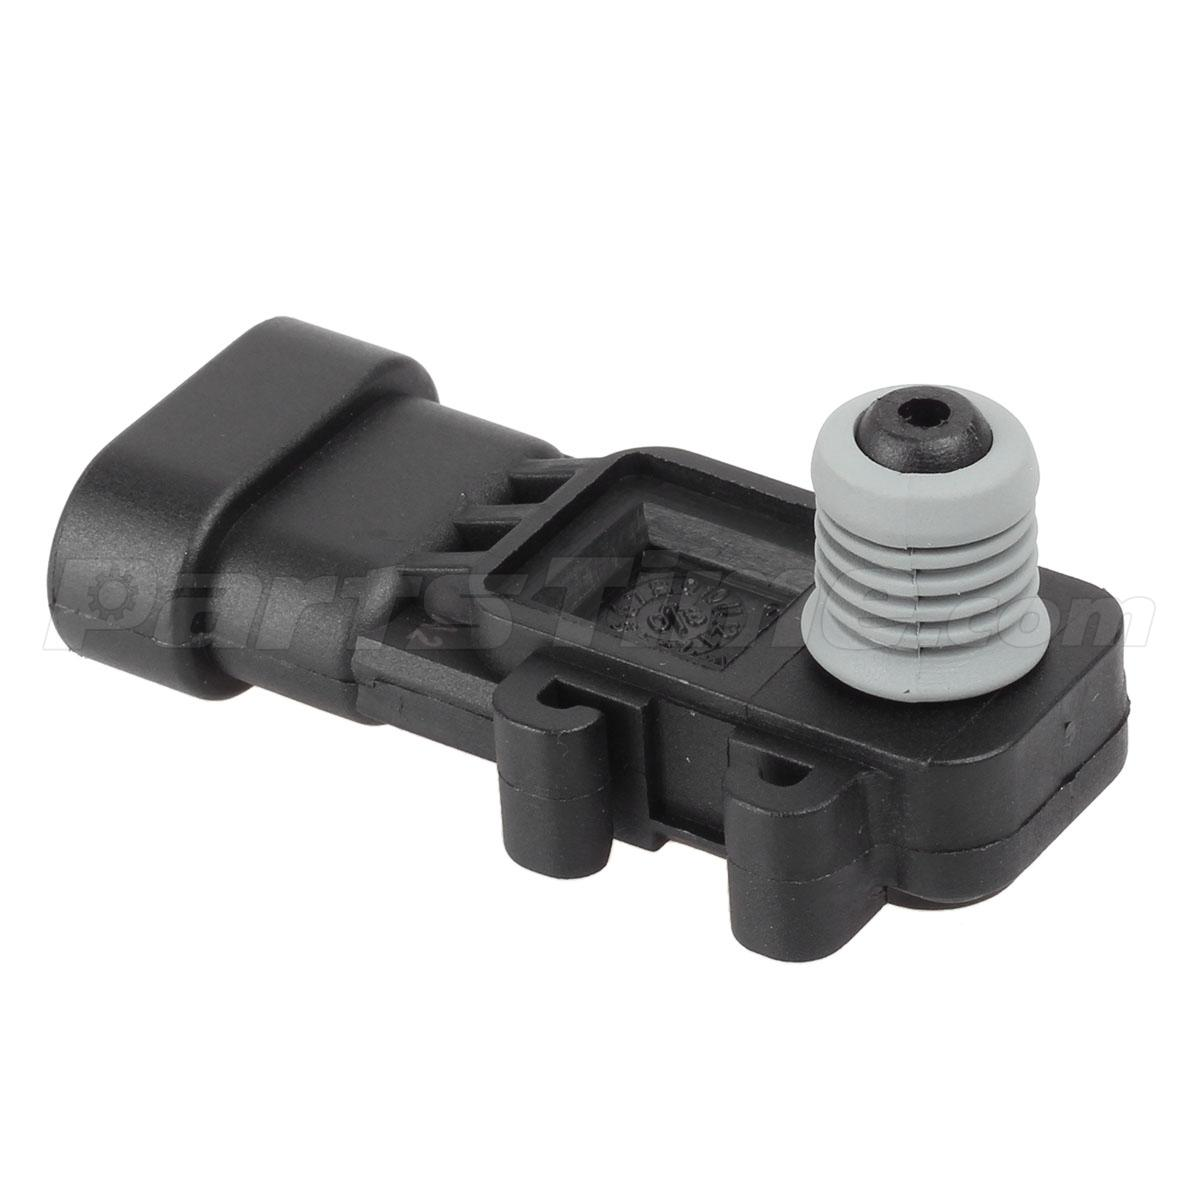 Su1390 16238399 As302 Fuel Tank Pressure Sensor For